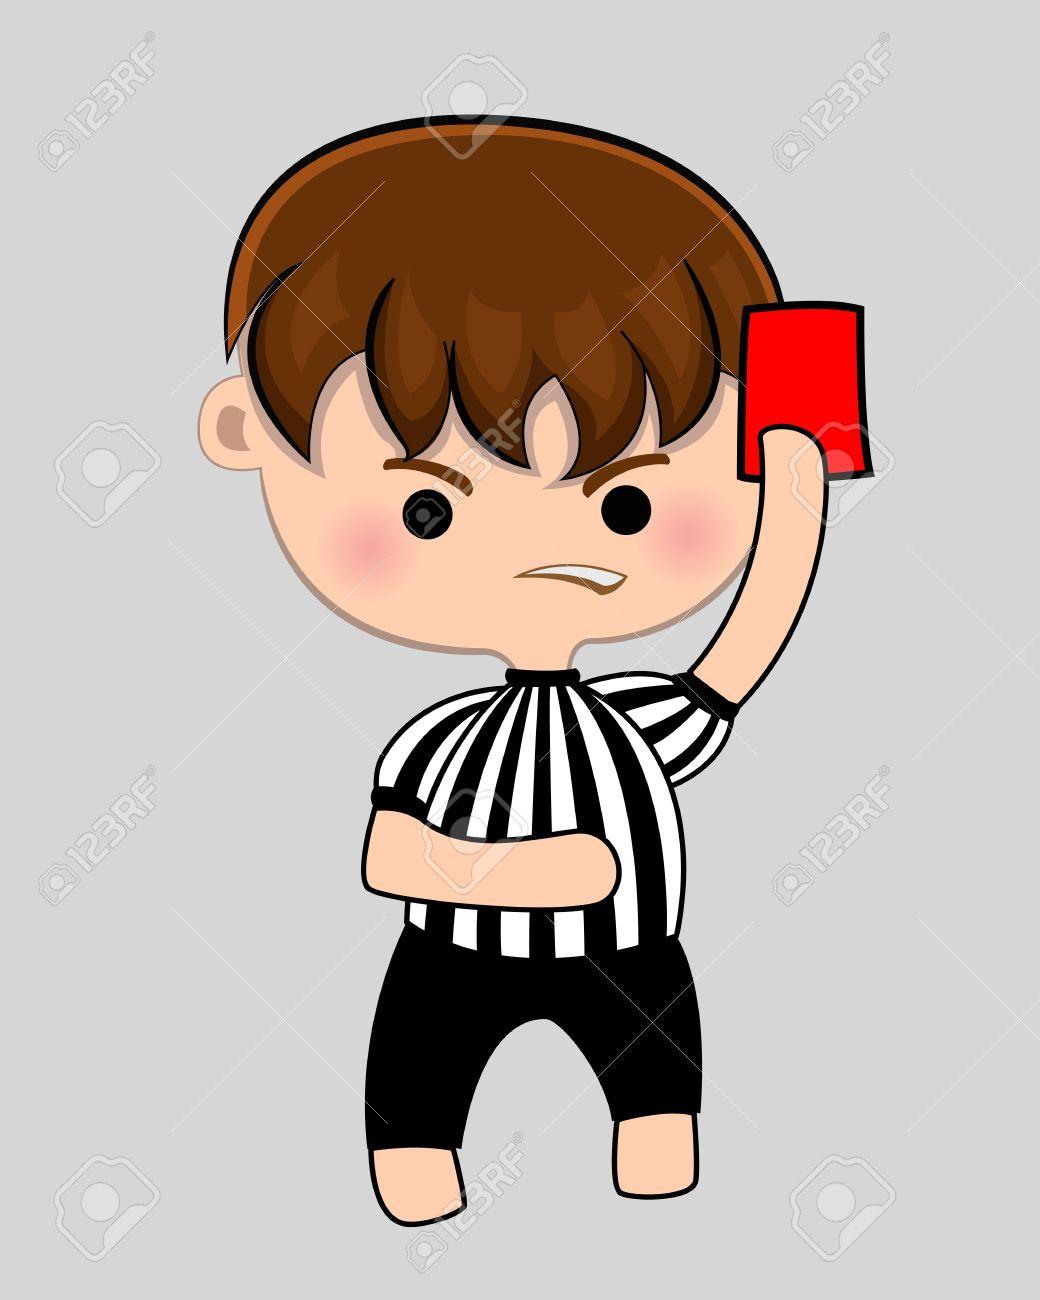 Free Football Referee Clipart.